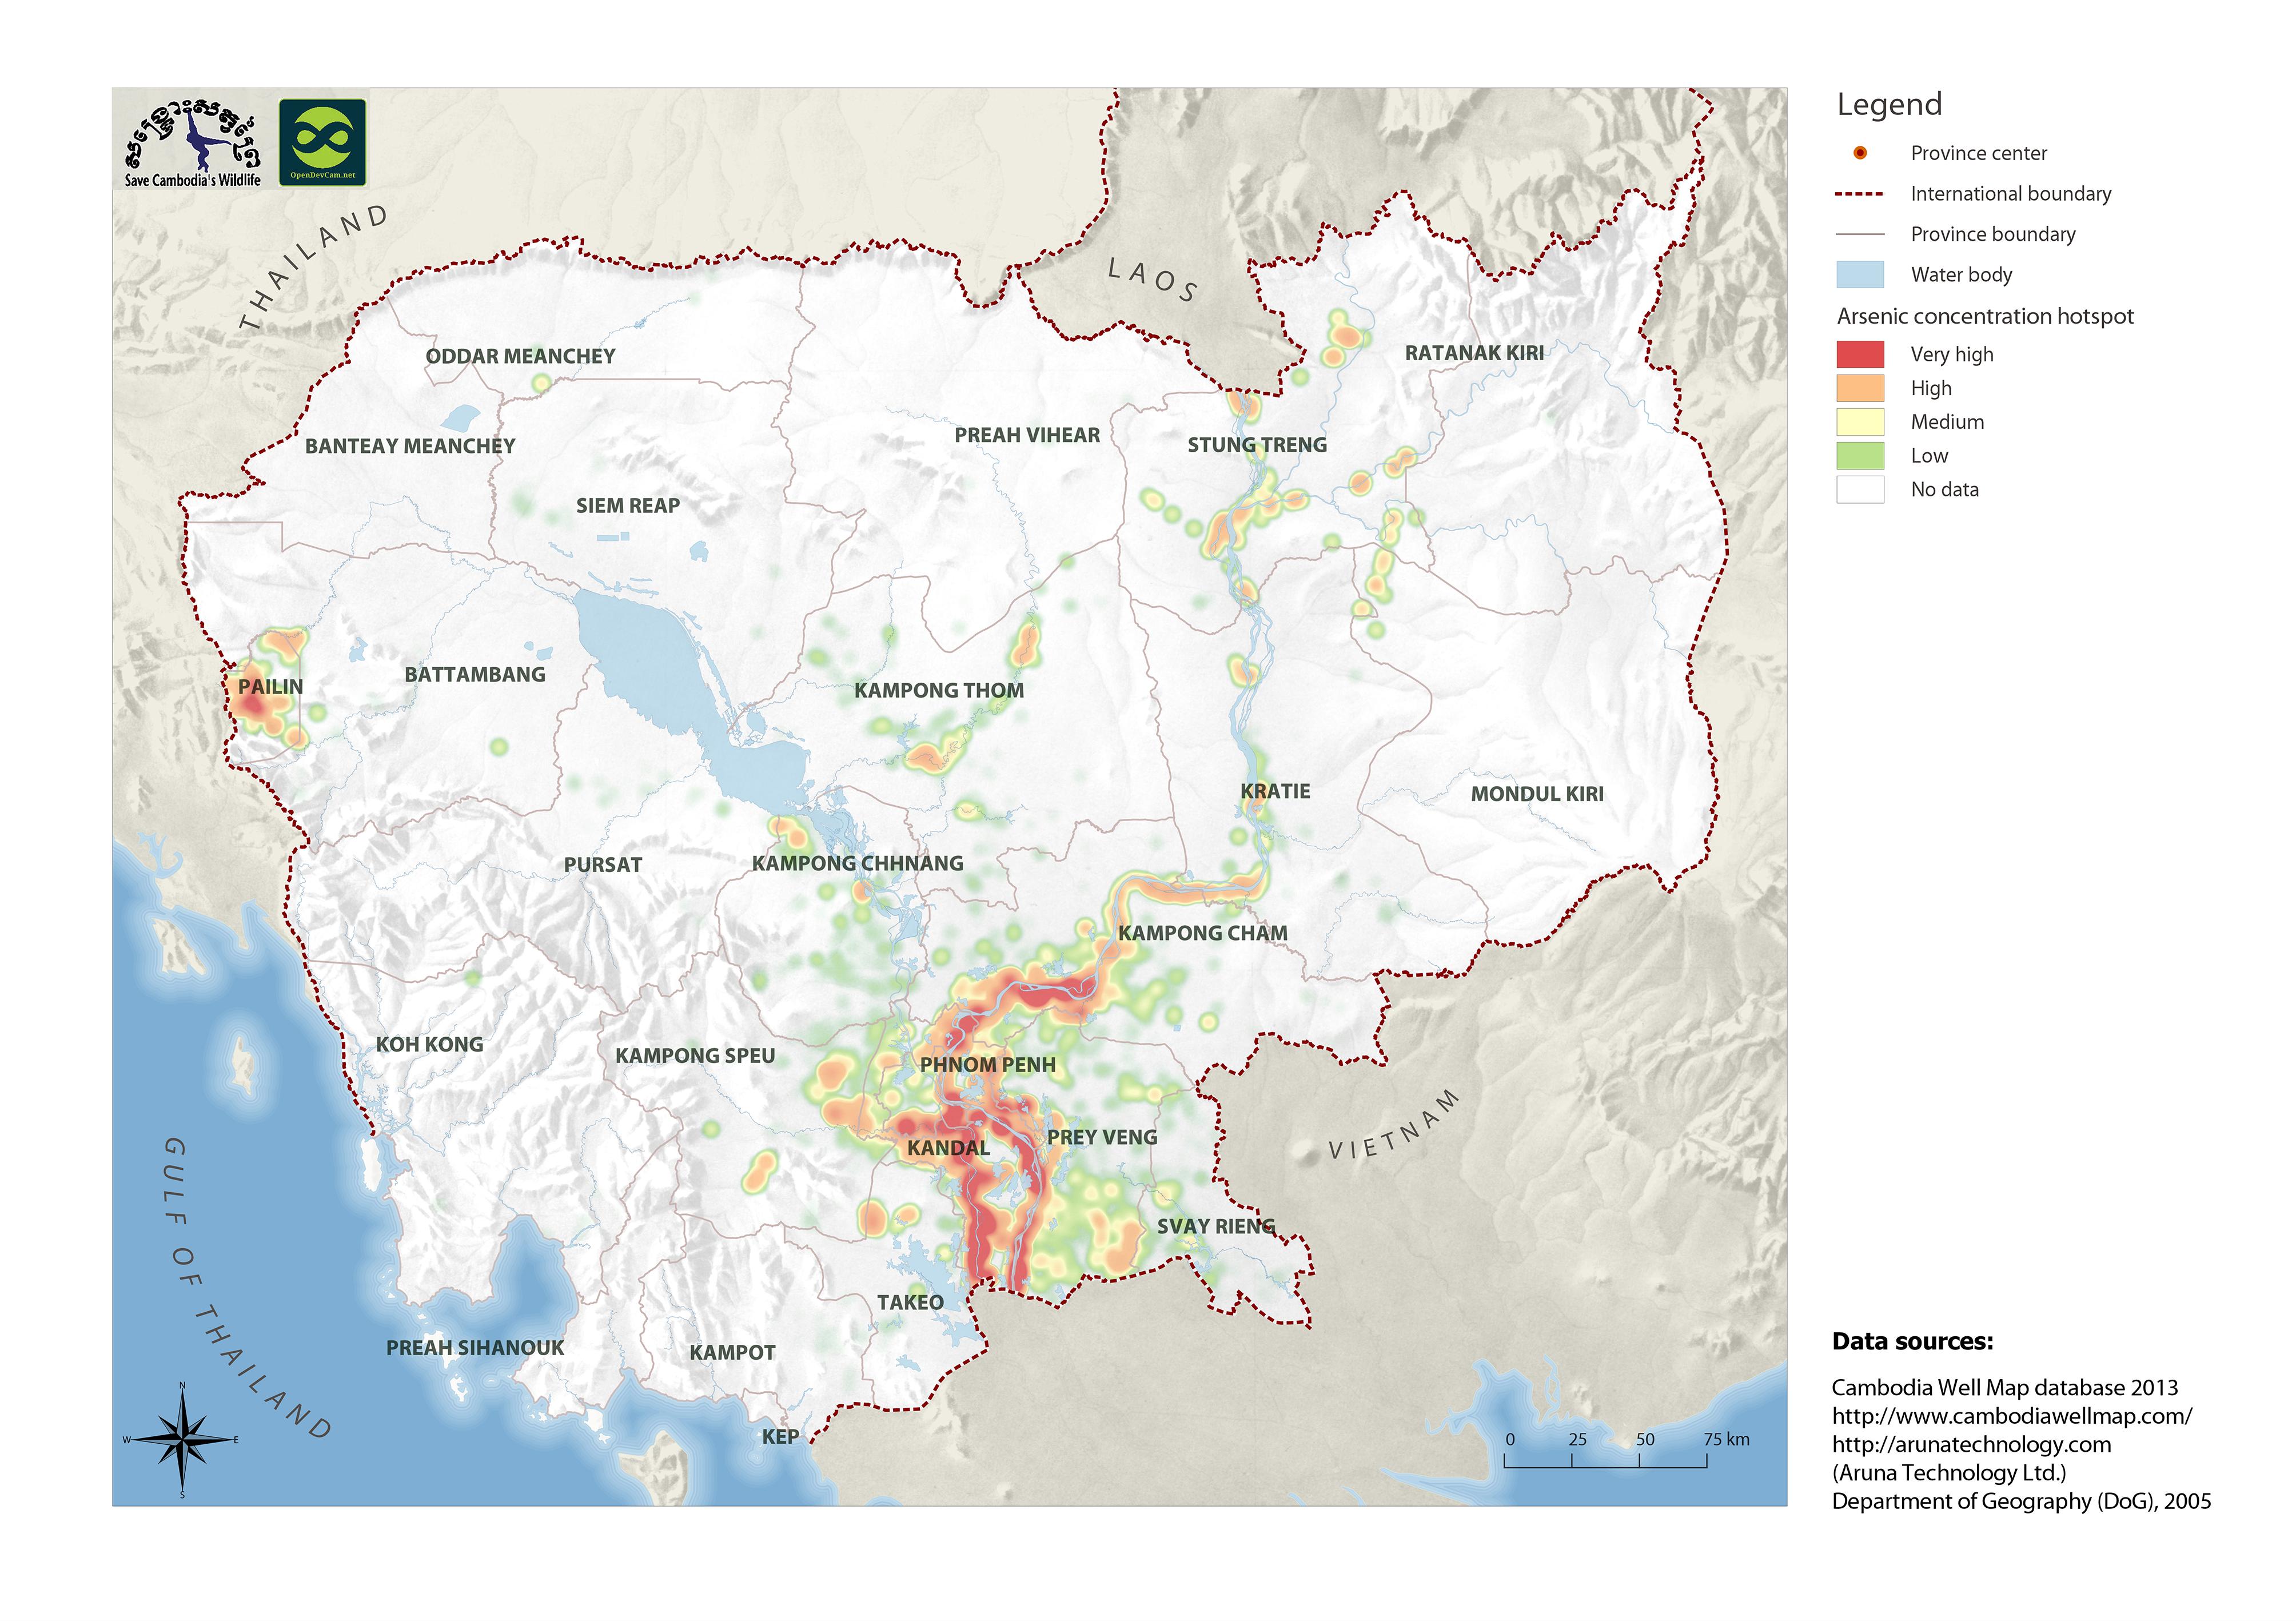 Layers | Open Development Cambodia (ODC) on el salvador map, syria map, indochina map, chad map, city map, burma map, phillipines map, china map, cameroon map, congo map, west indies map, bangladesh map, africa map, korea map, qatar map, burundi map, martinique map, europe map, japan map, benin map, da nang map, bulgaria map, bhutan map, pacific islands map, east timor map, eritrea map,